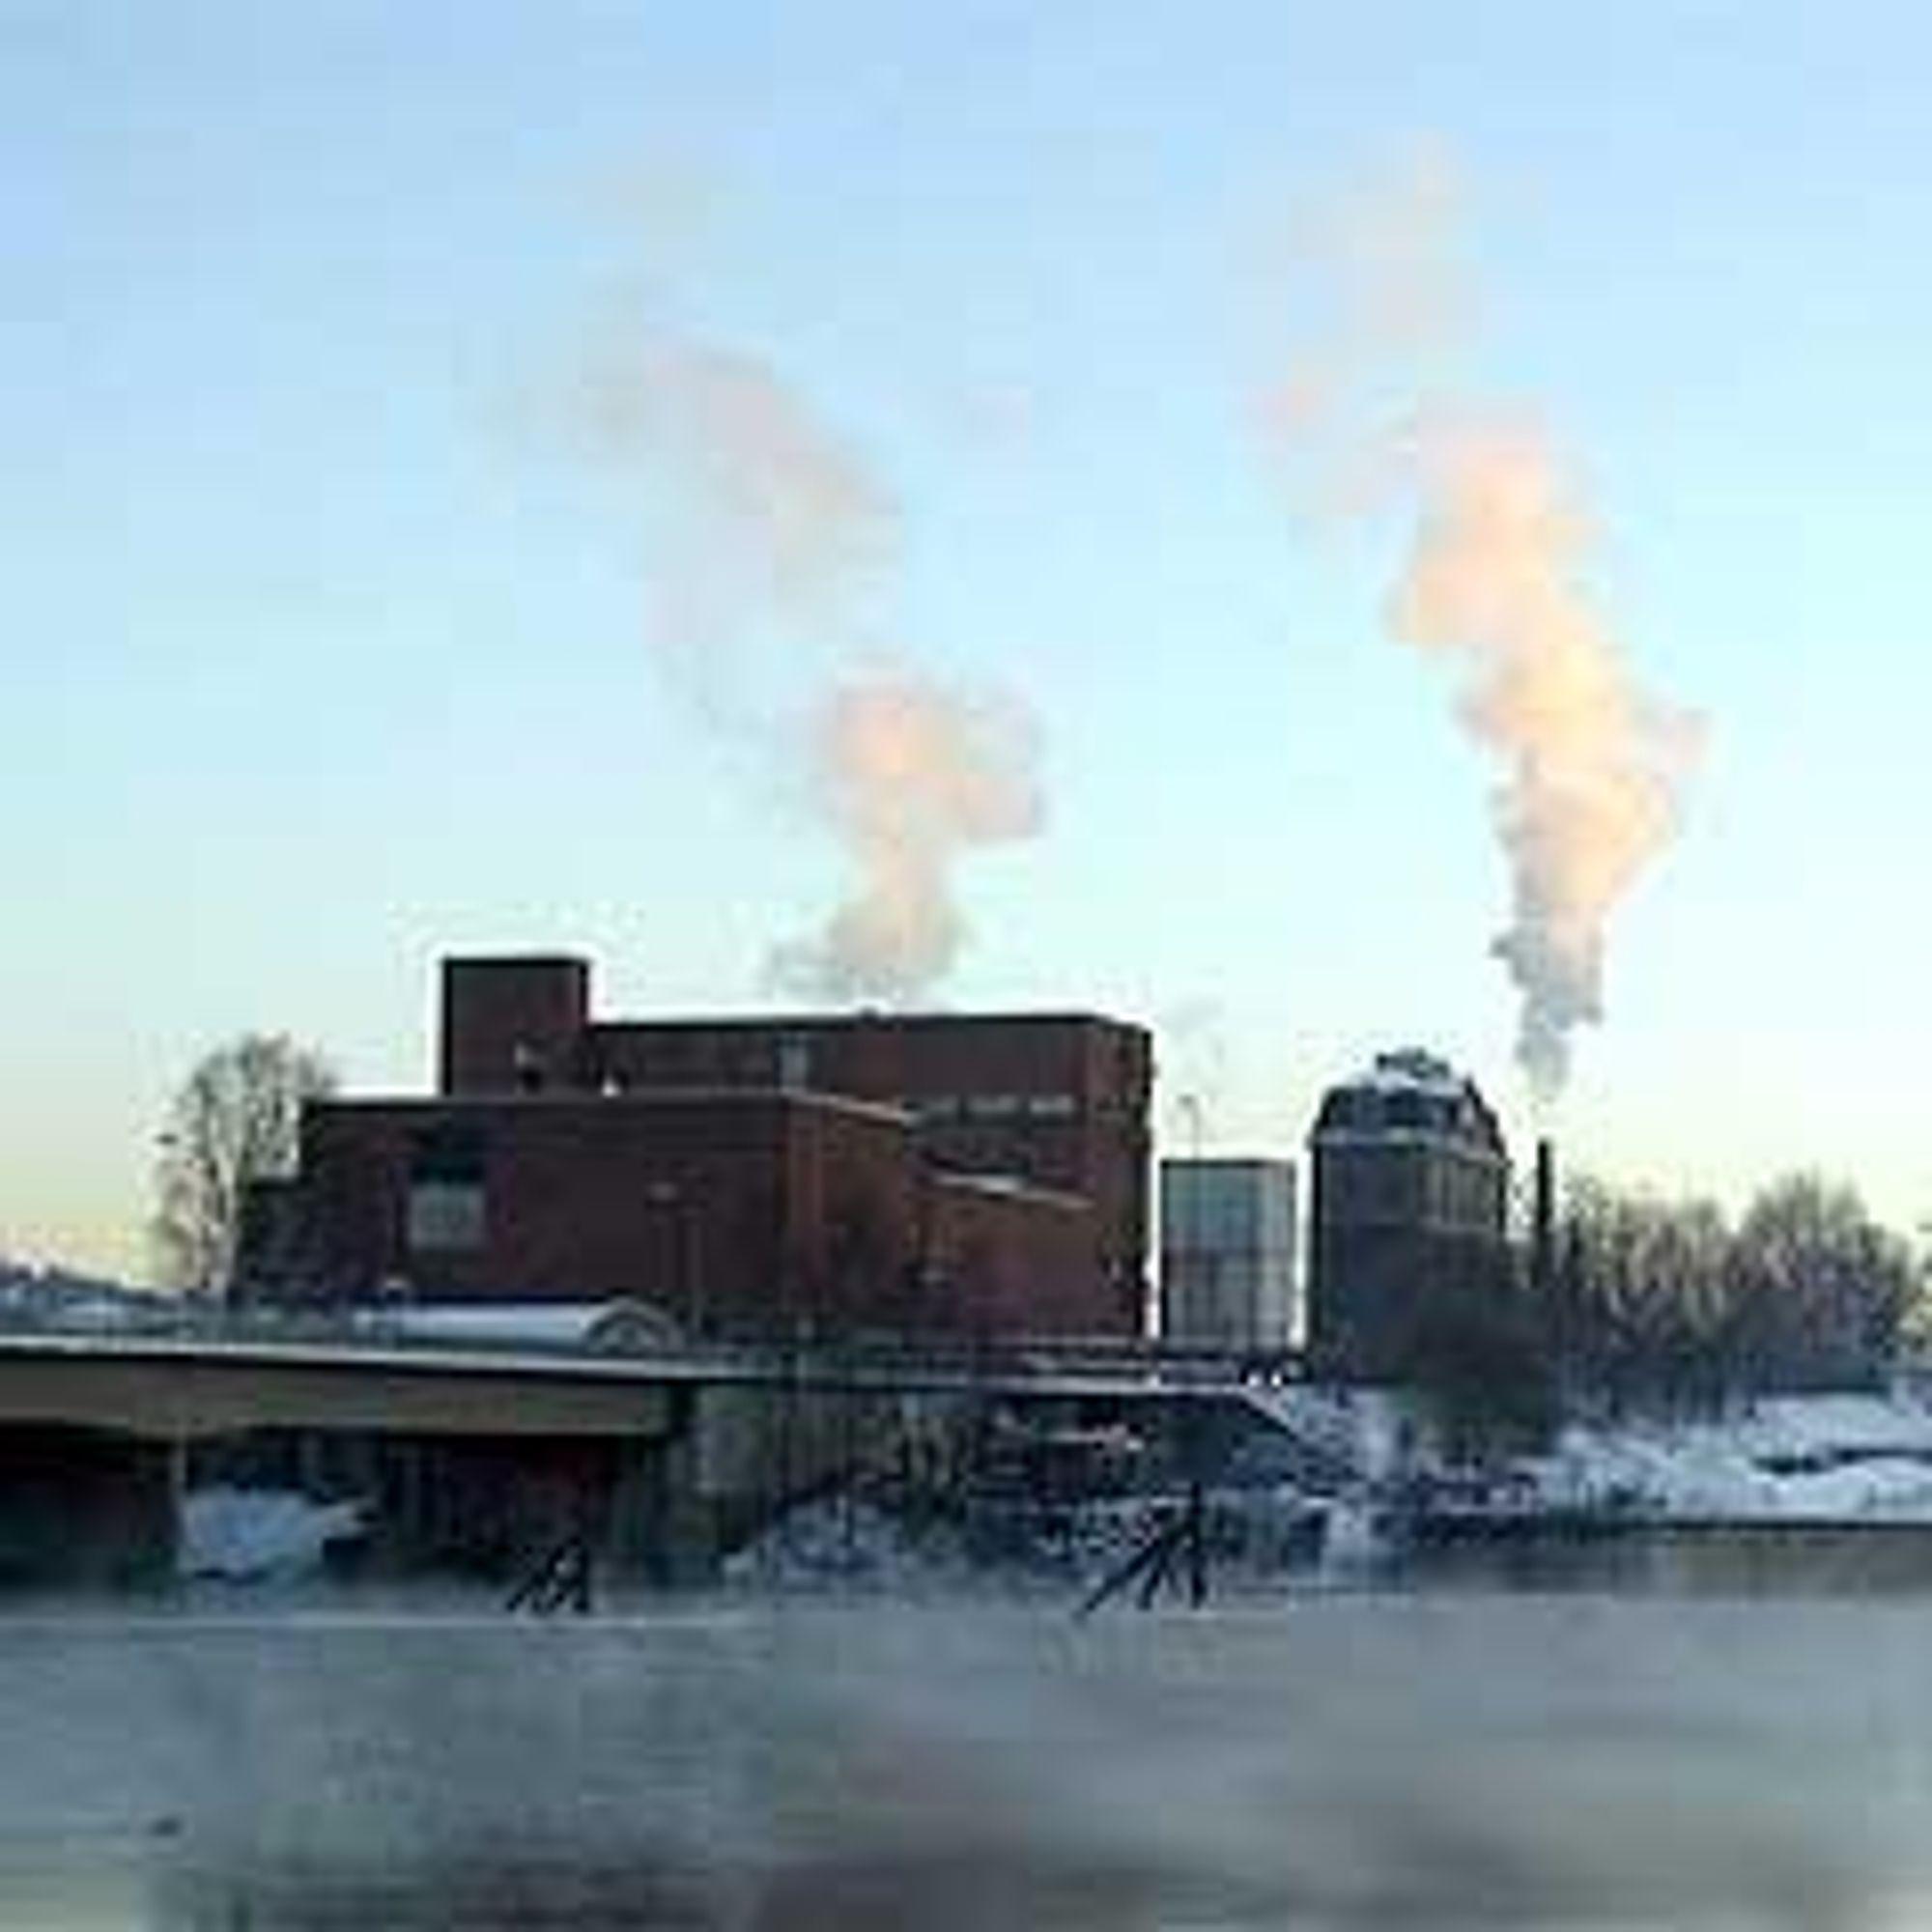 Union papir fabrikk skien